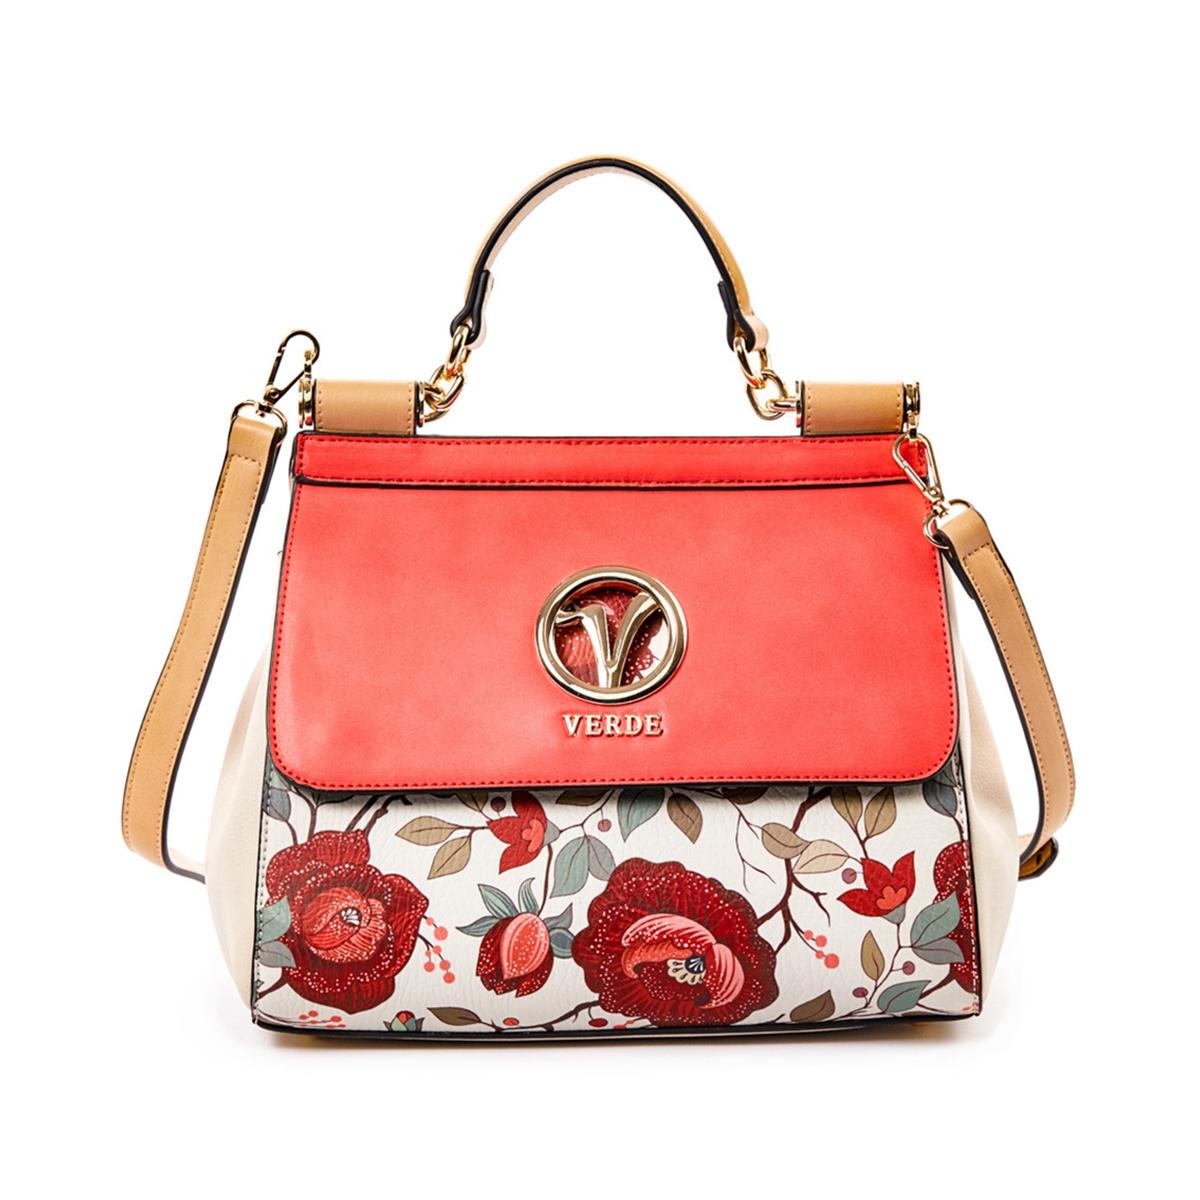 cf61c42182 Τσάντα Ώμου-Χειρός Με Floral Τύπωμα Verde 16-5035 Κοραλί